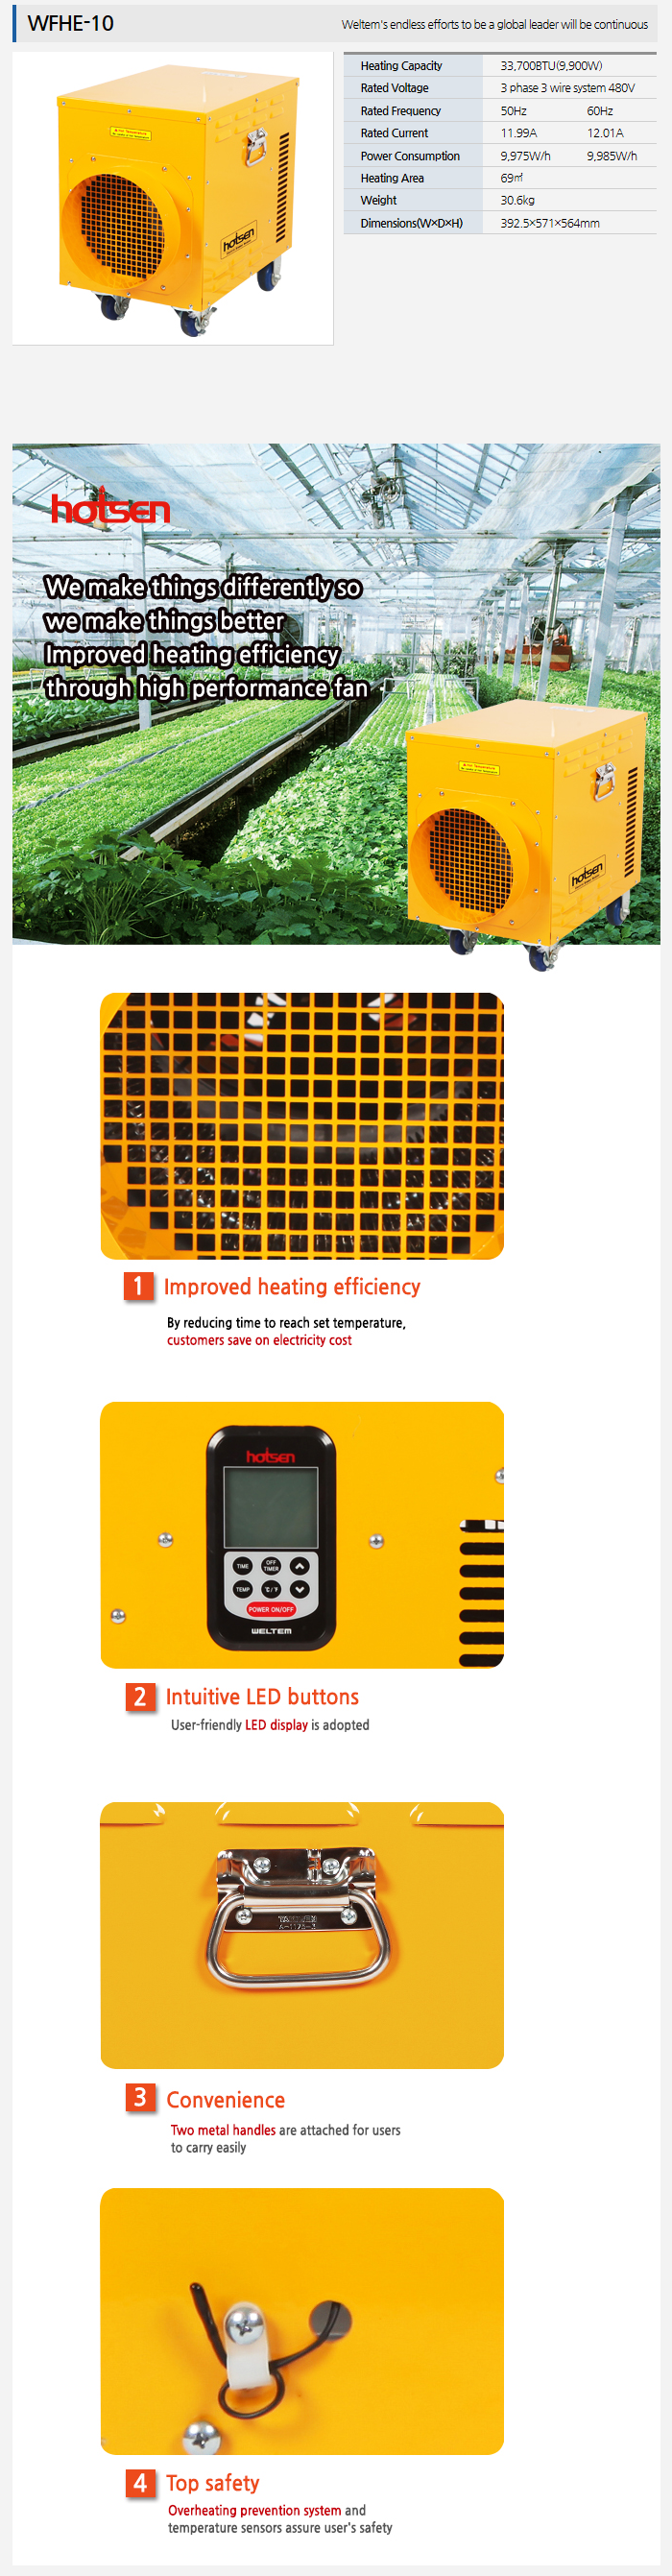 WELTEM Electric Blower Heater (480V) WFHE-10